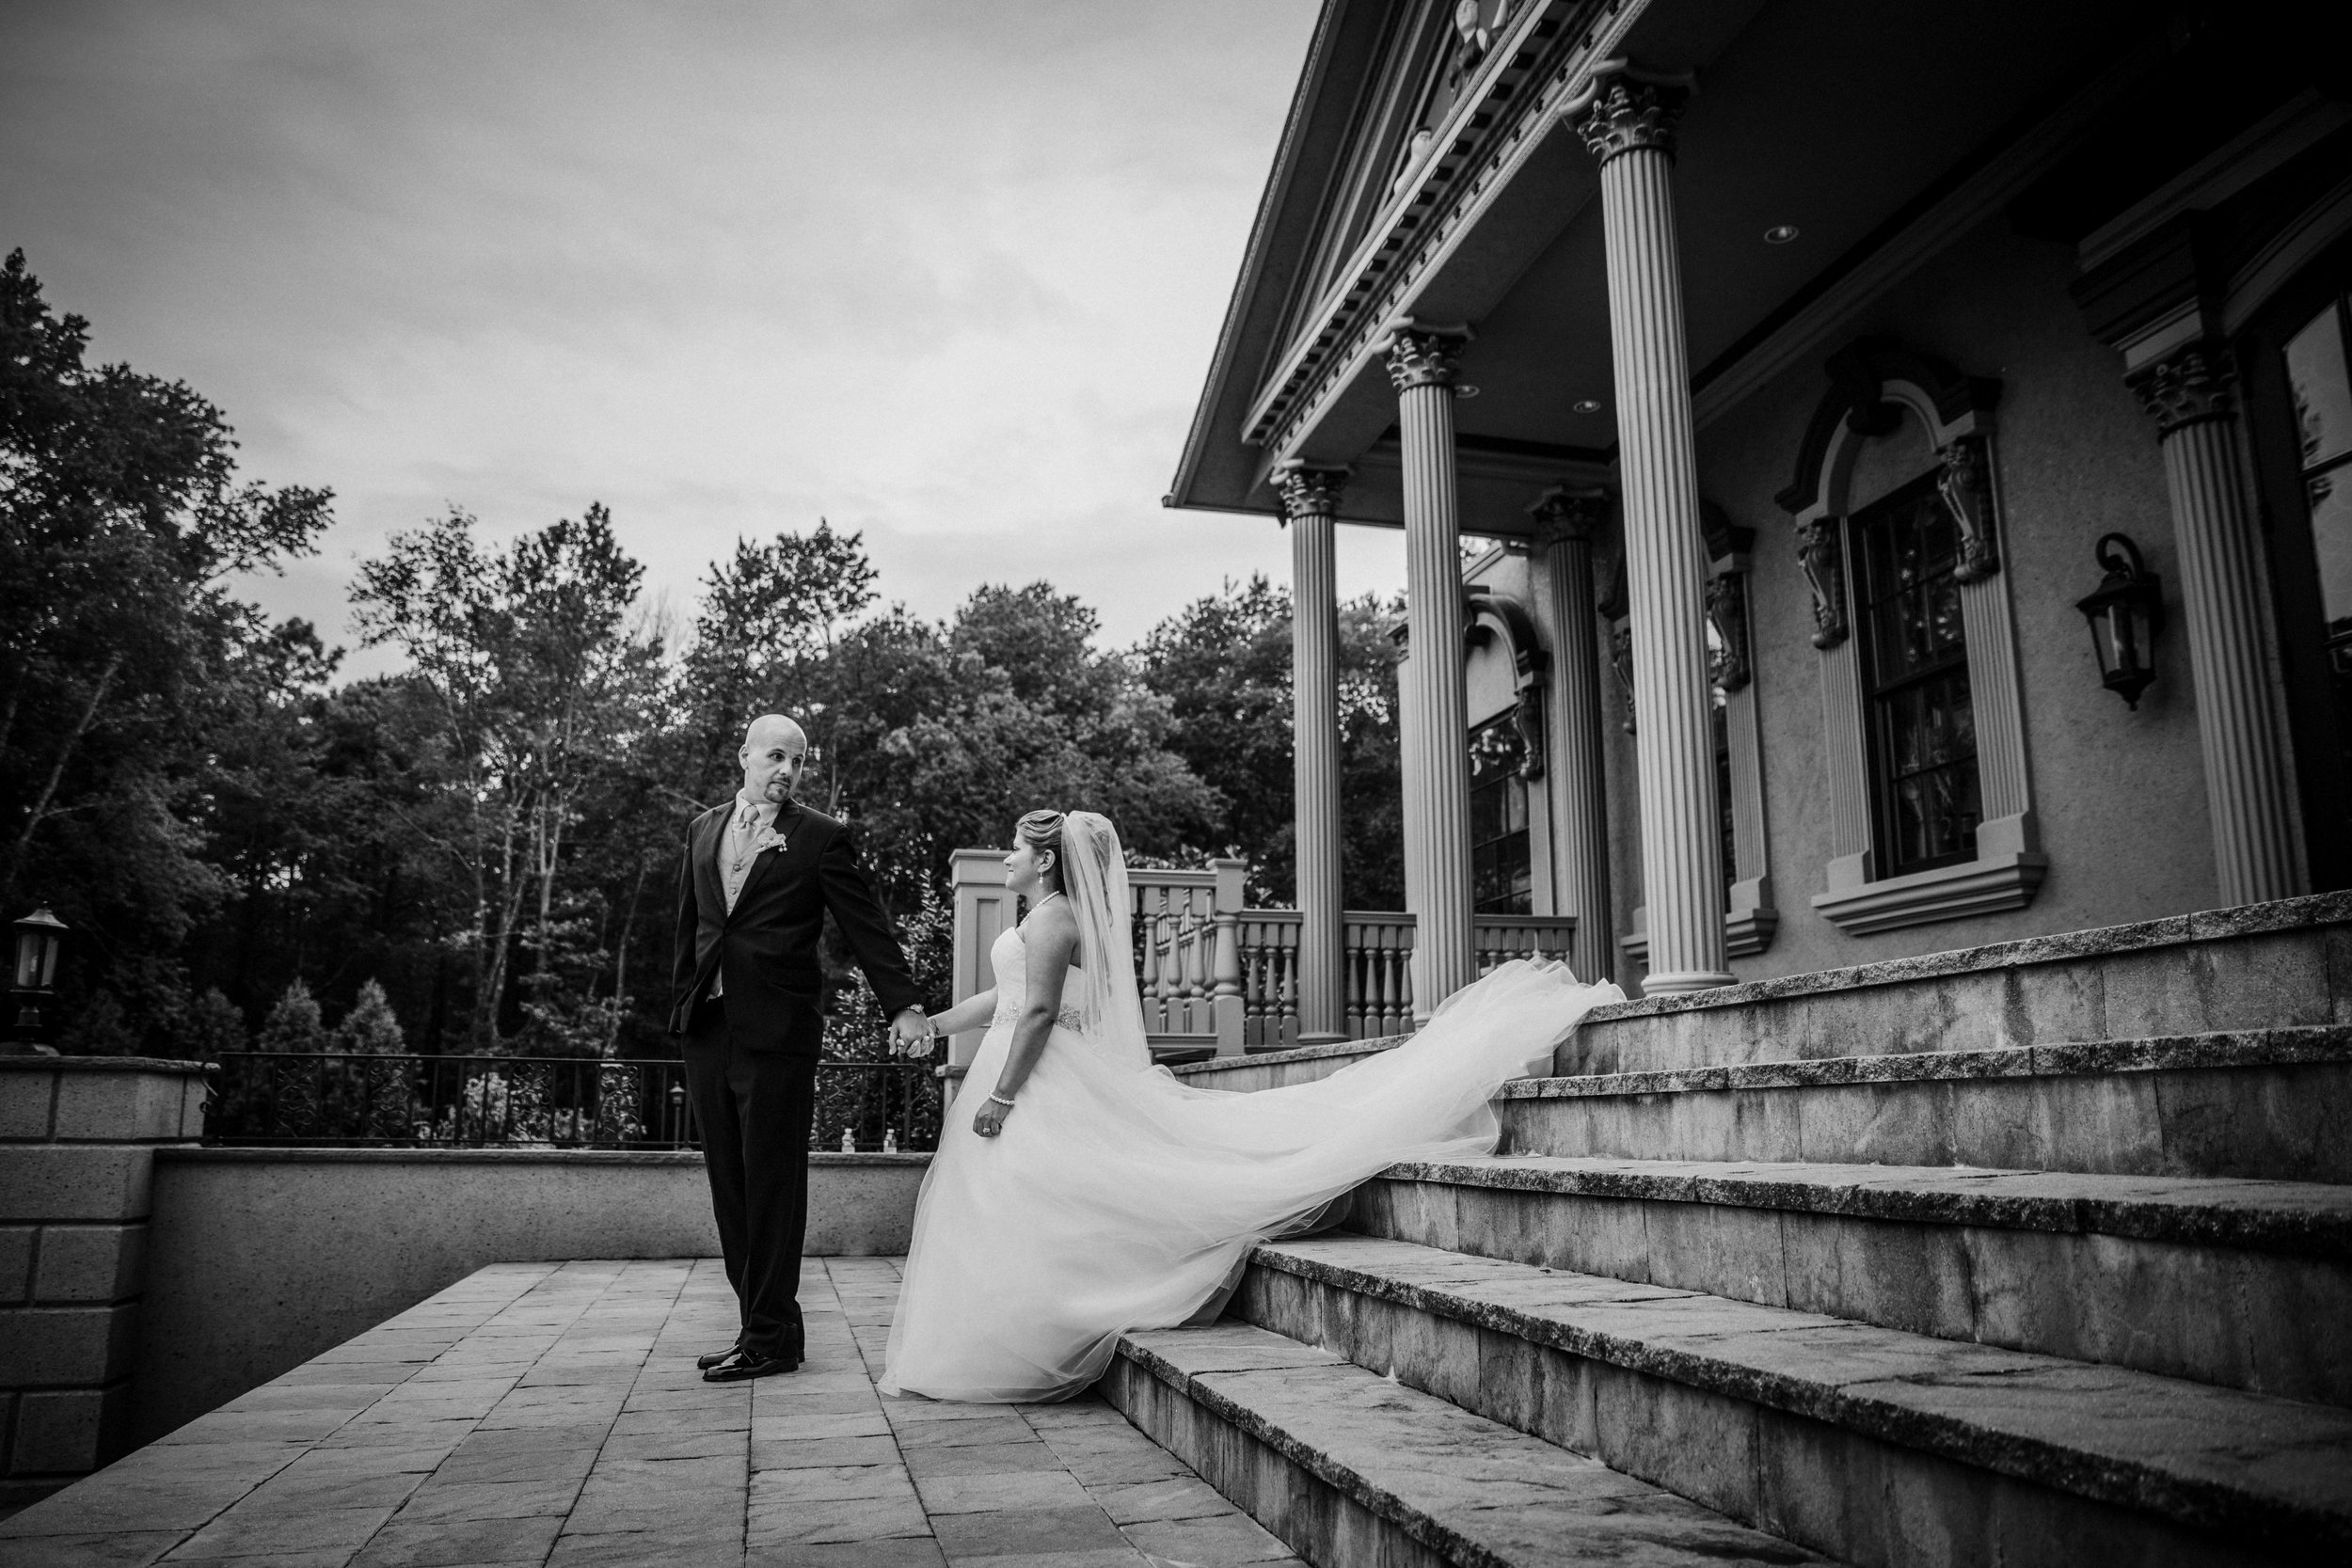 NewJersey_Wedding_Photography_Brigalias_Bride&Groom_Tara&Pete_BW-35.jpg